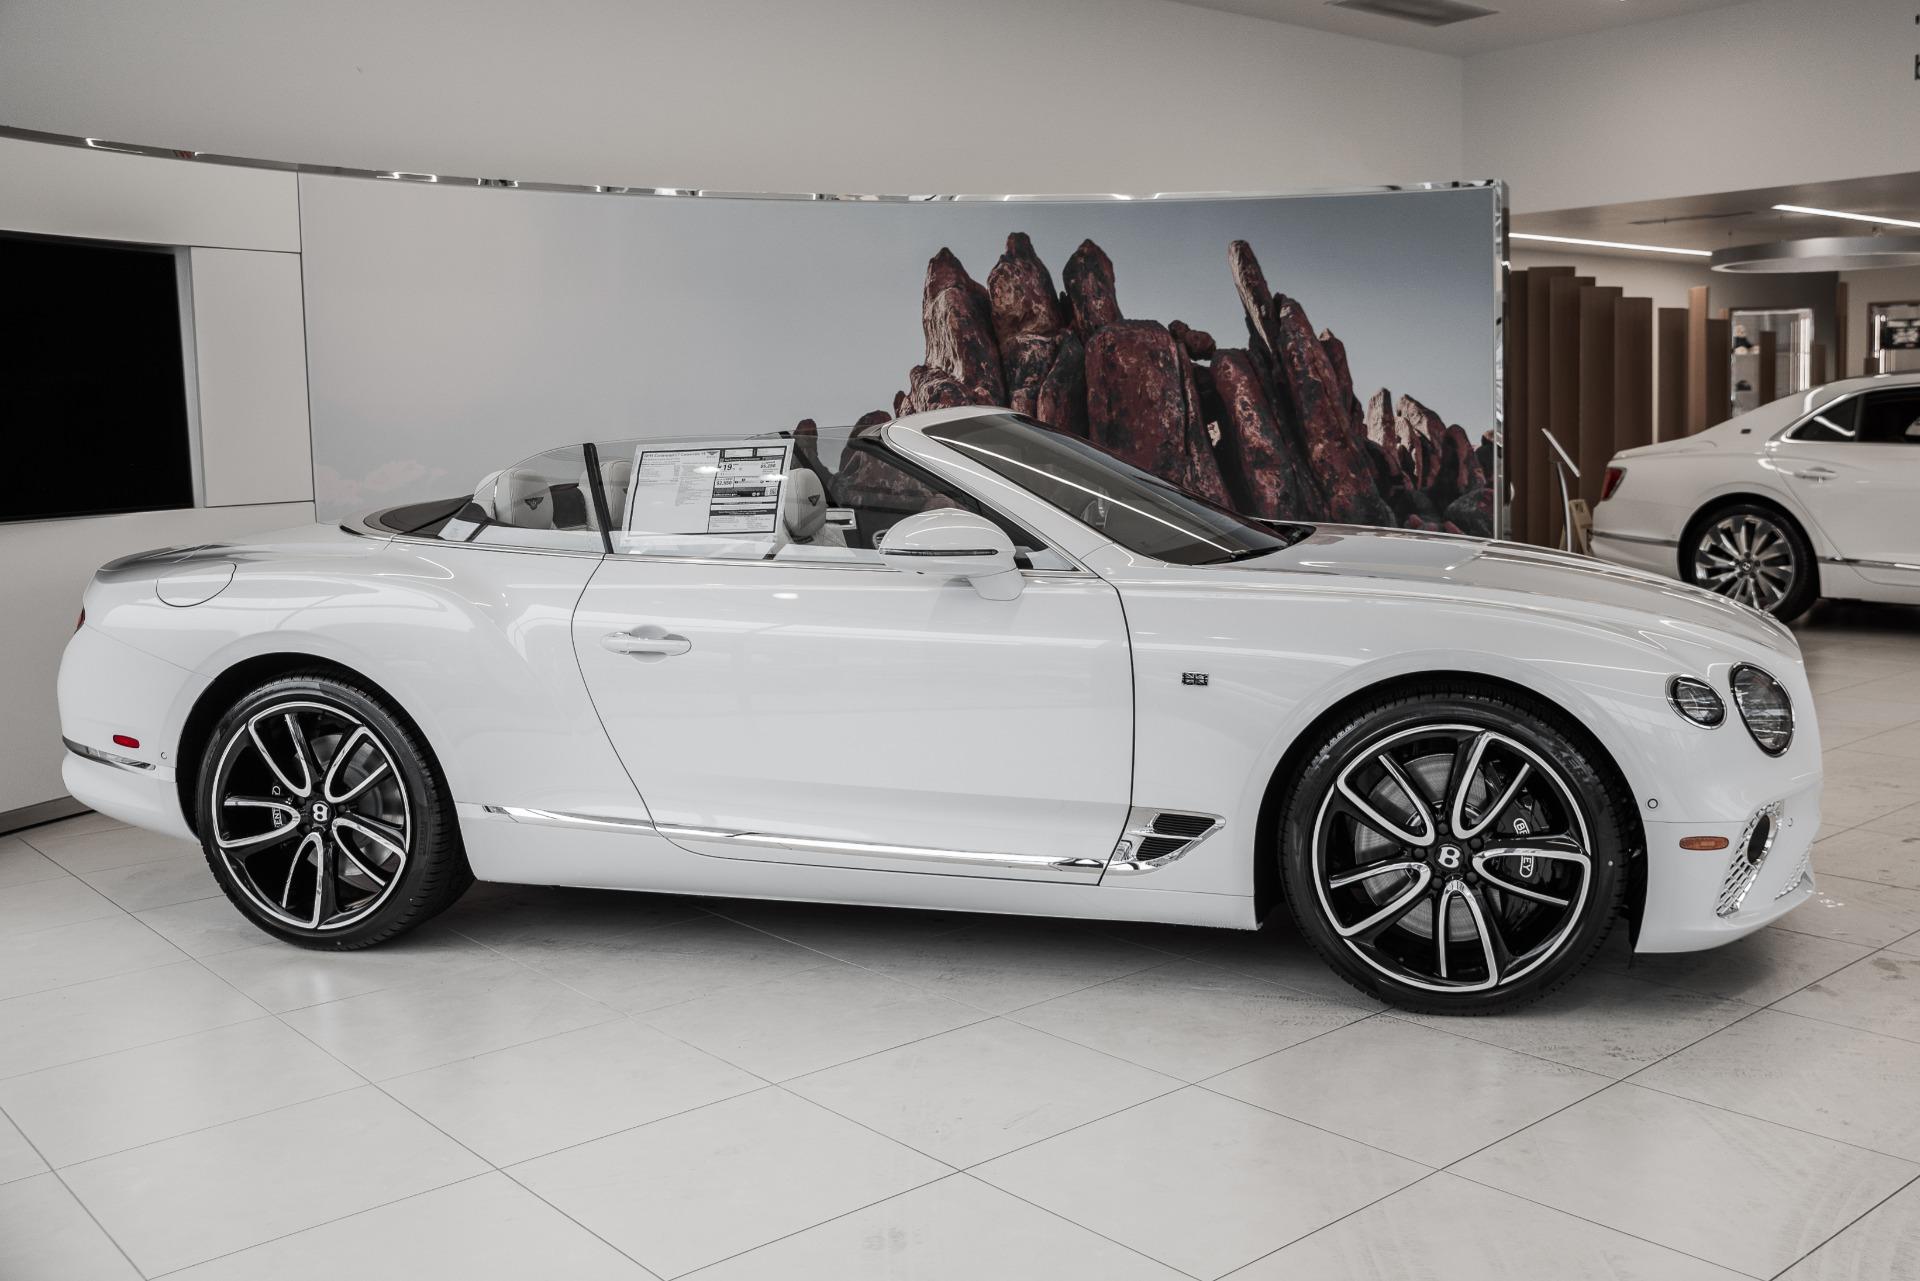 New-2020-Bentley-Continental-GT-V8-Convertible